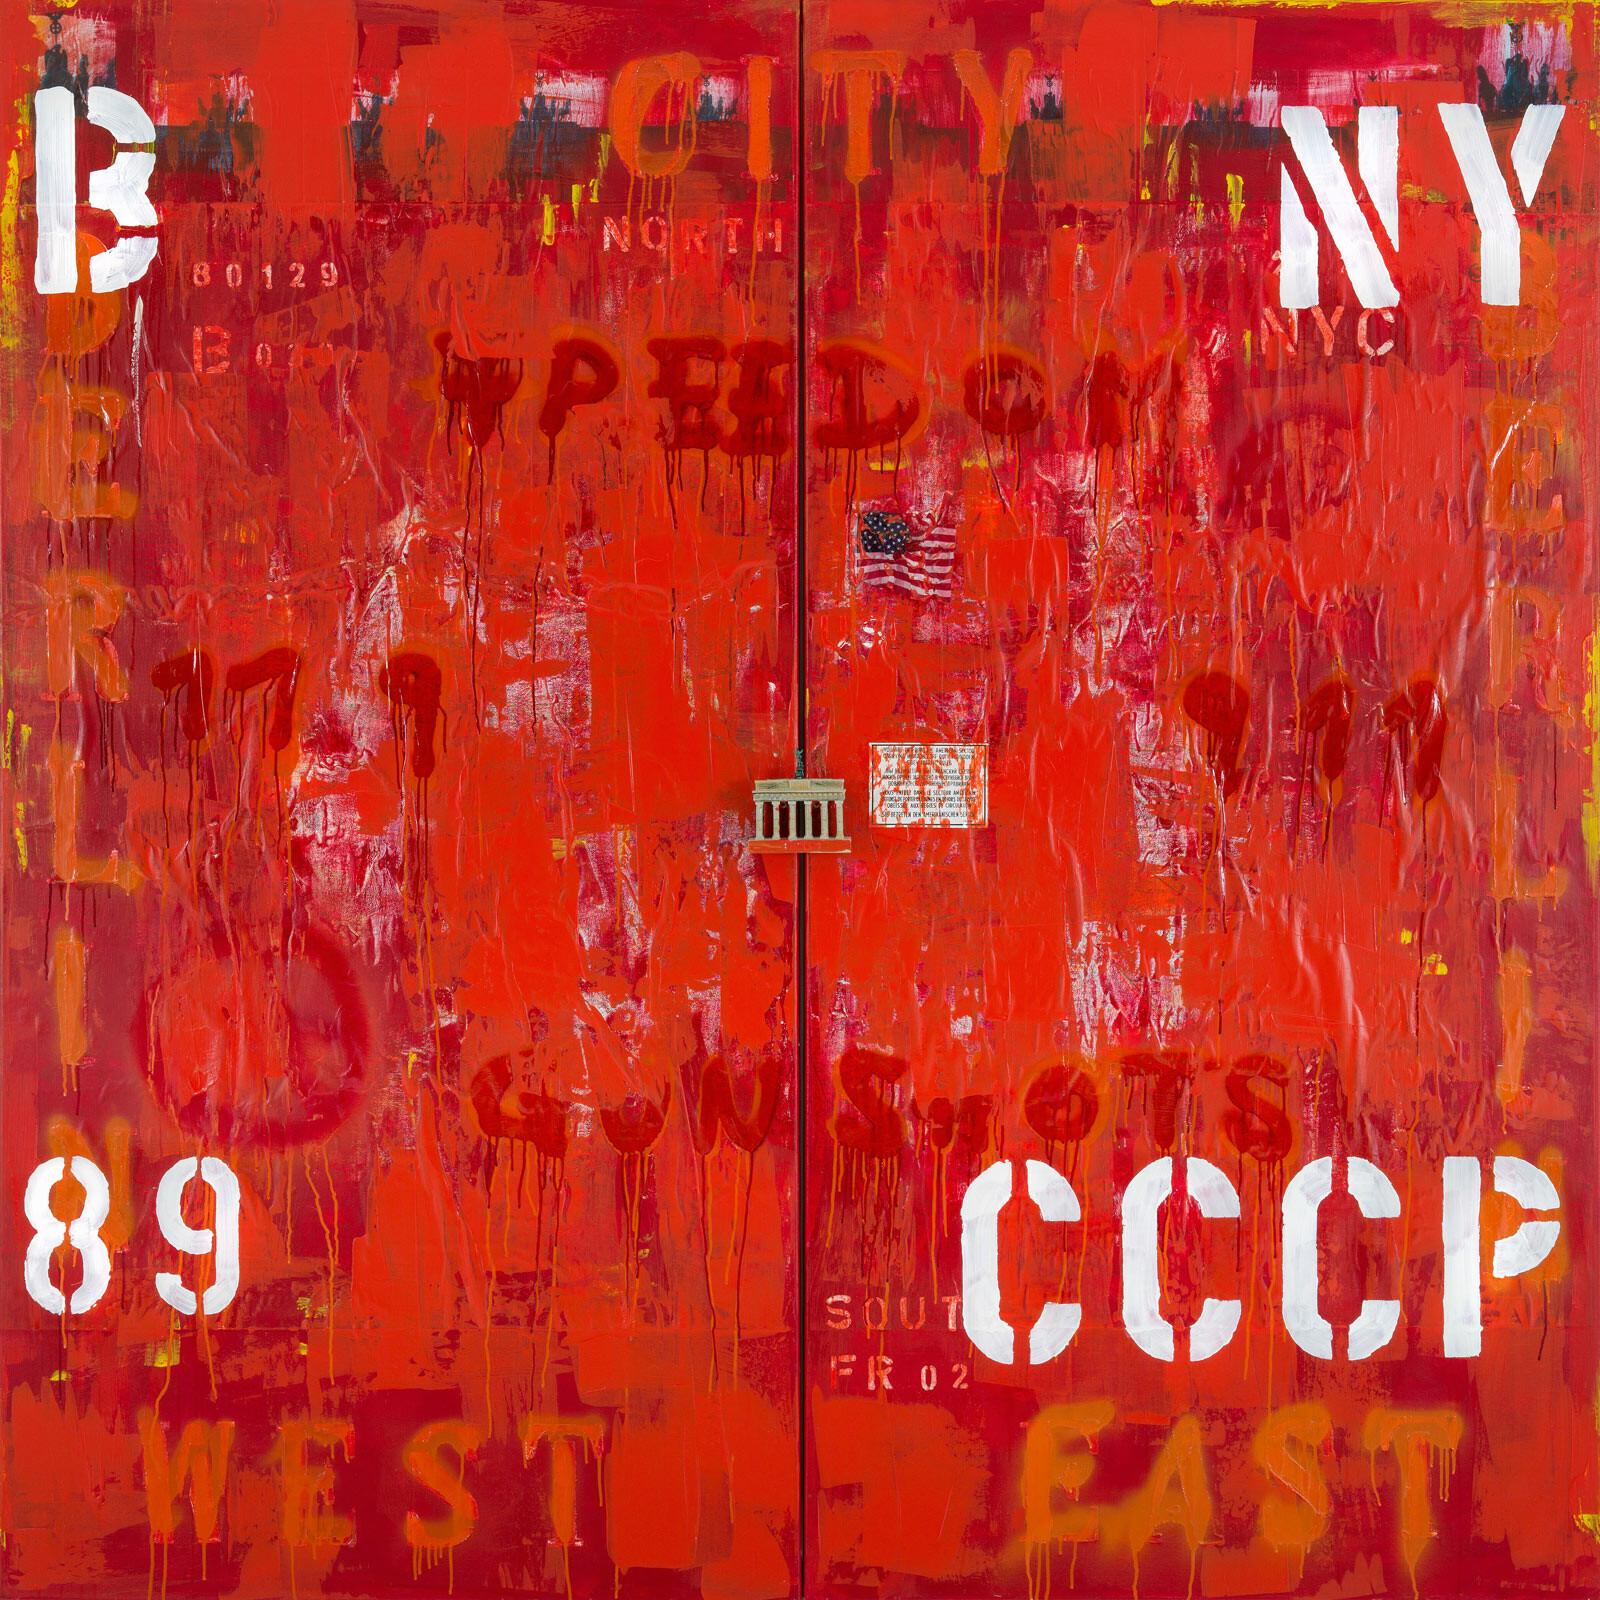 New York / CCCP - Freddy Reitz